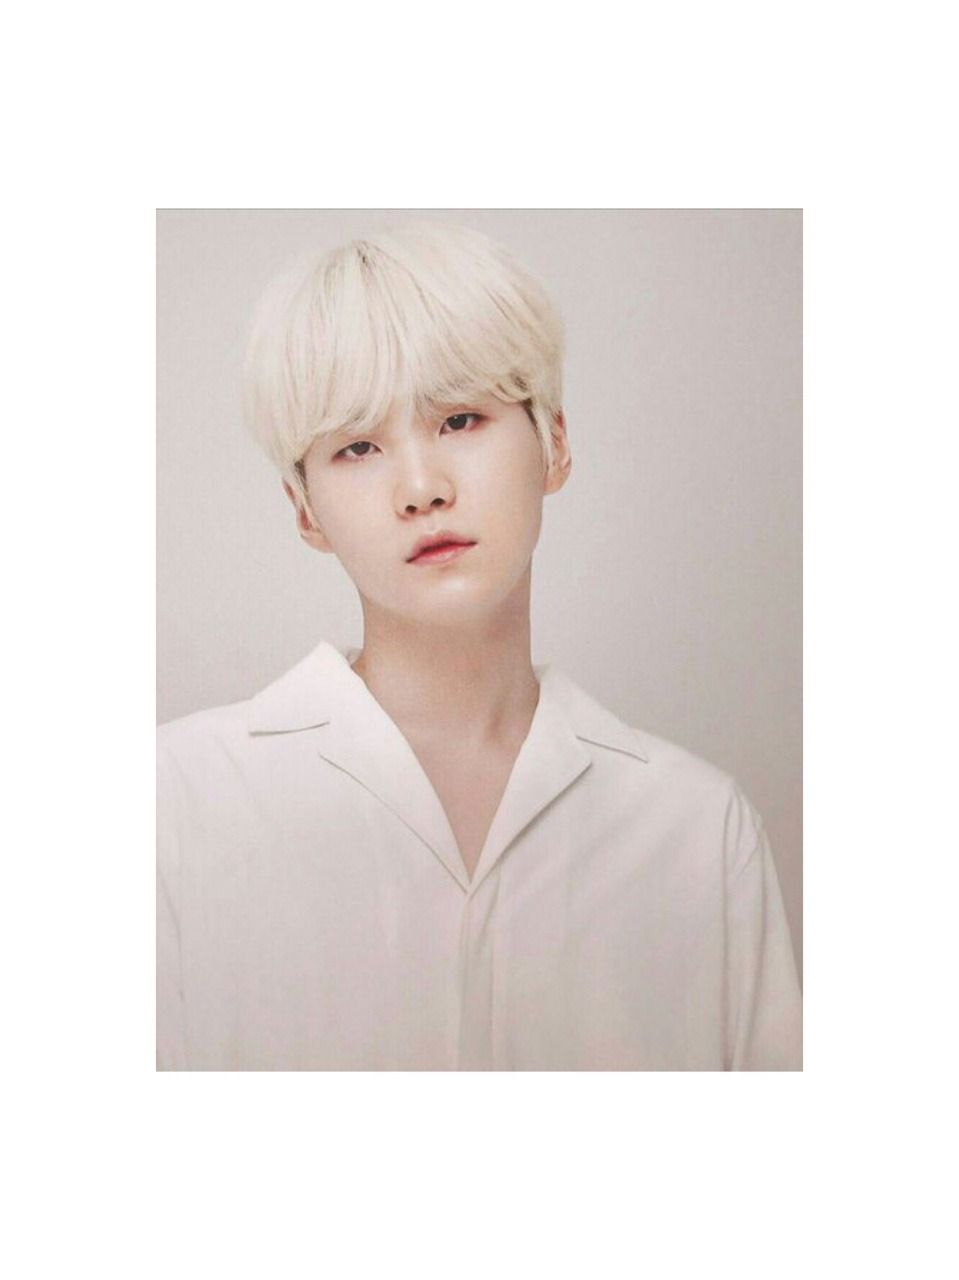 Yoongi White Aesthetic White Aesthetic Dog Adoption Min Yoongi Wallpaper Wallpaper hp suga bts